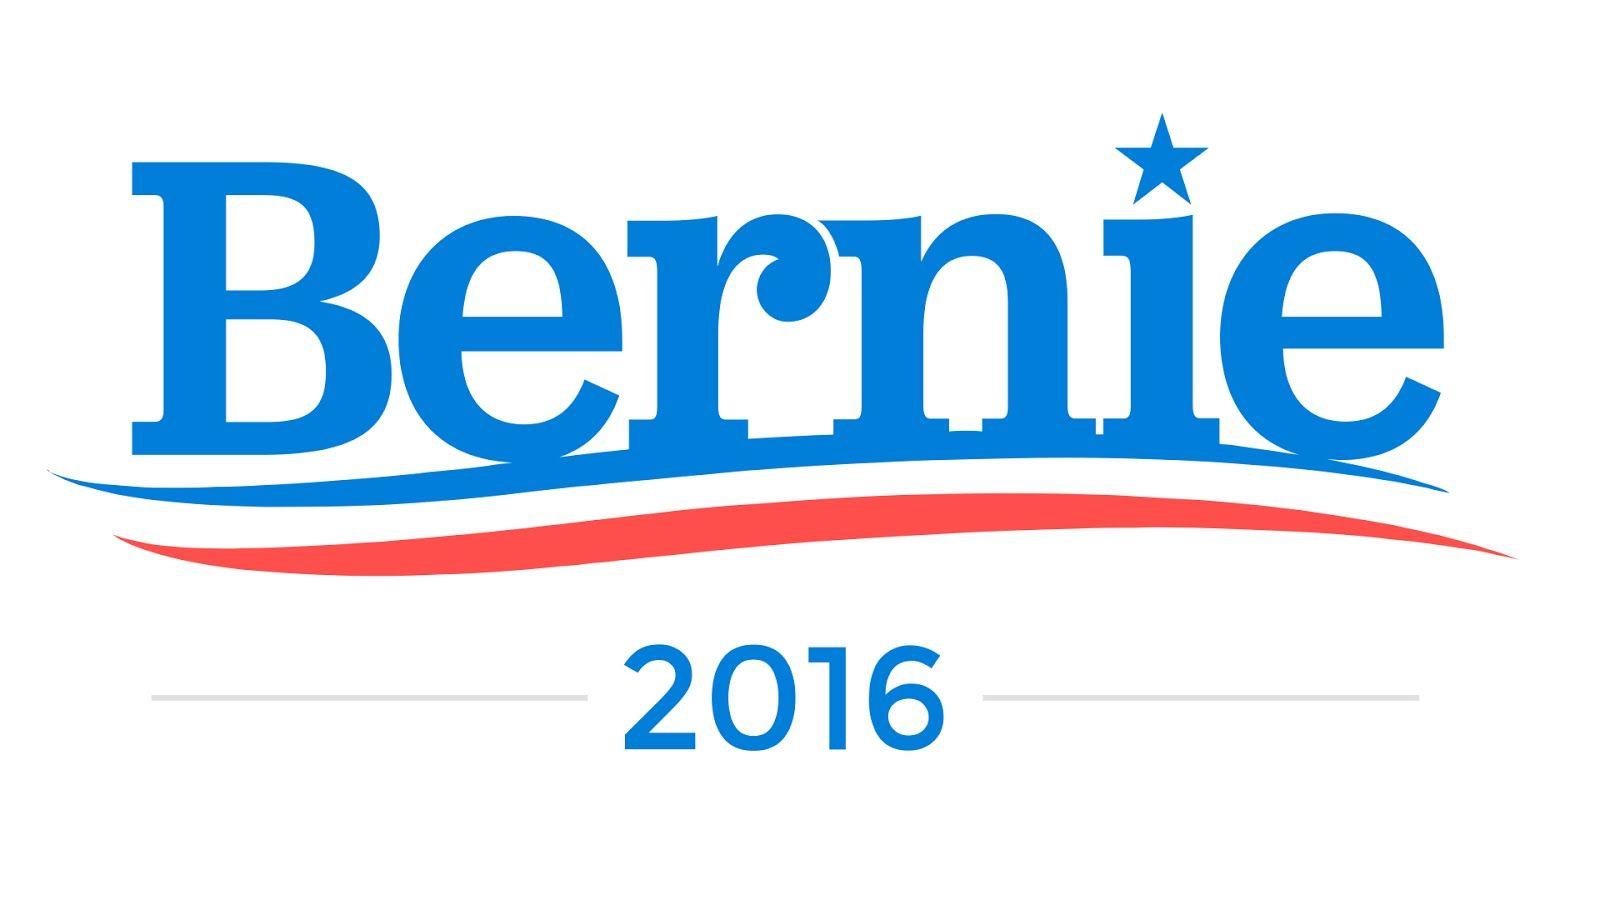 The Bernie Sanders Campaign Logo With Images Bernie Sanders